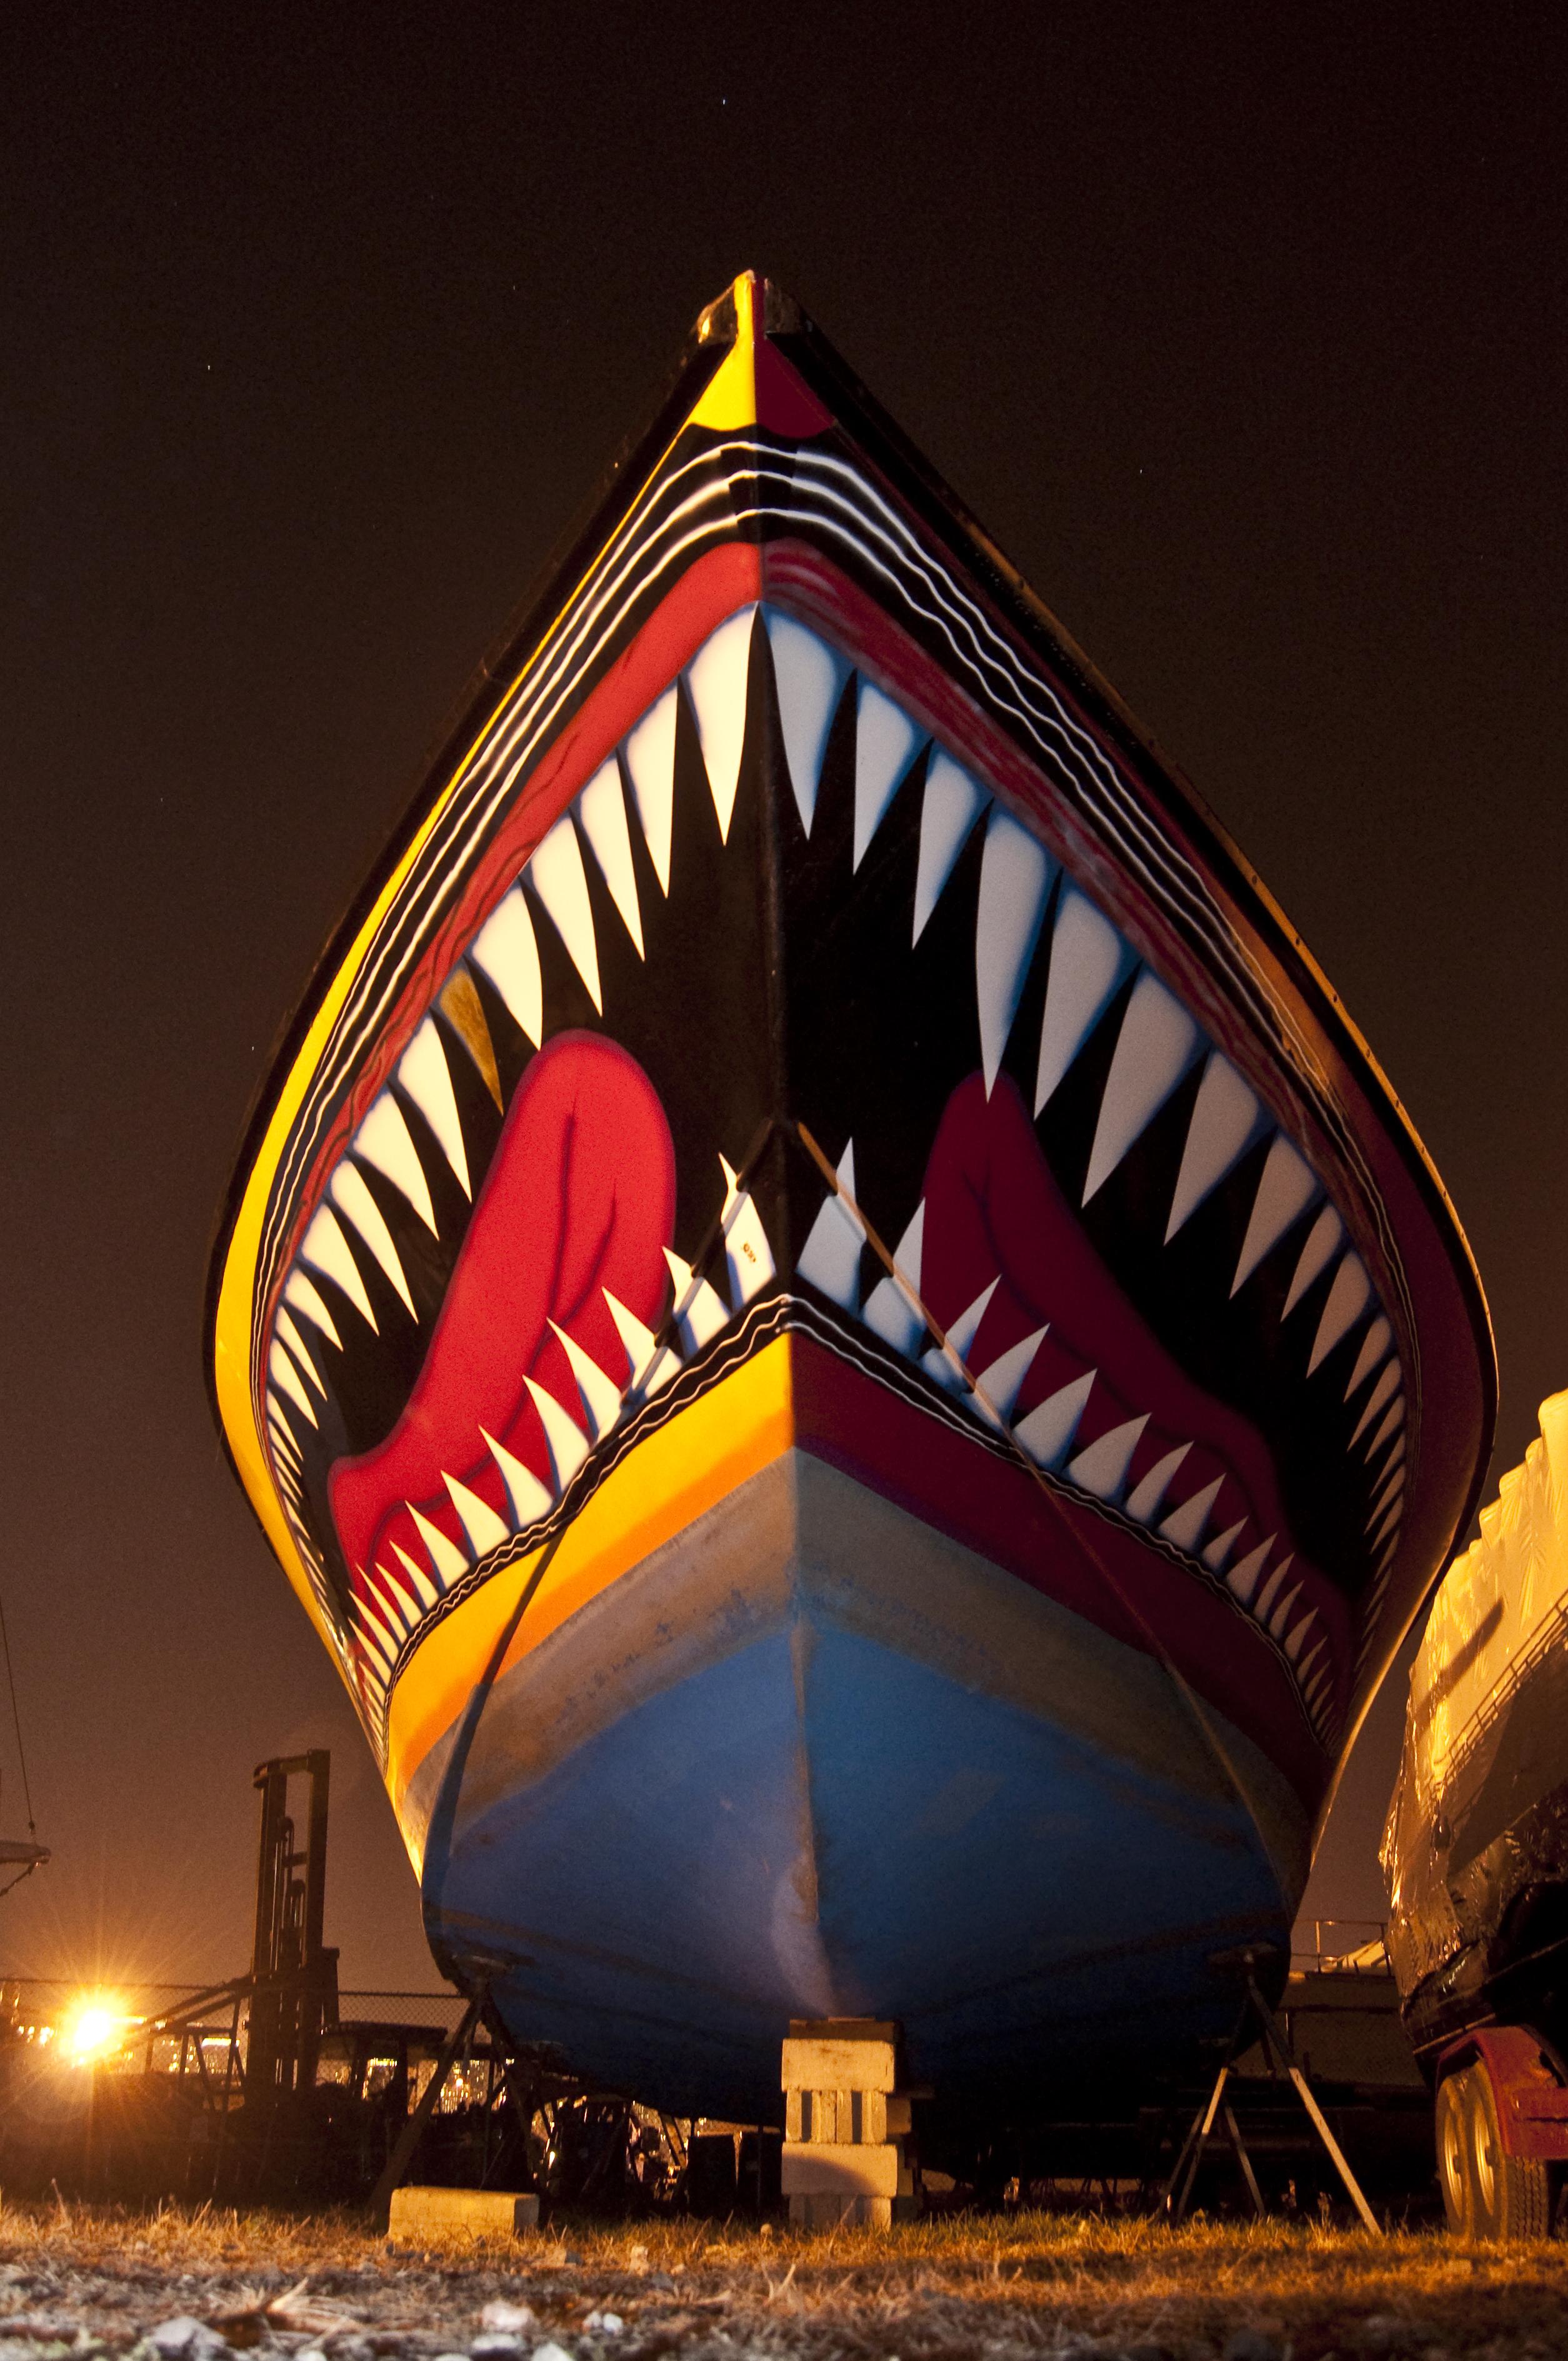 File:Big Mouth Boat (4088034861).jpg - Wikimedia Commons Libertystatepark